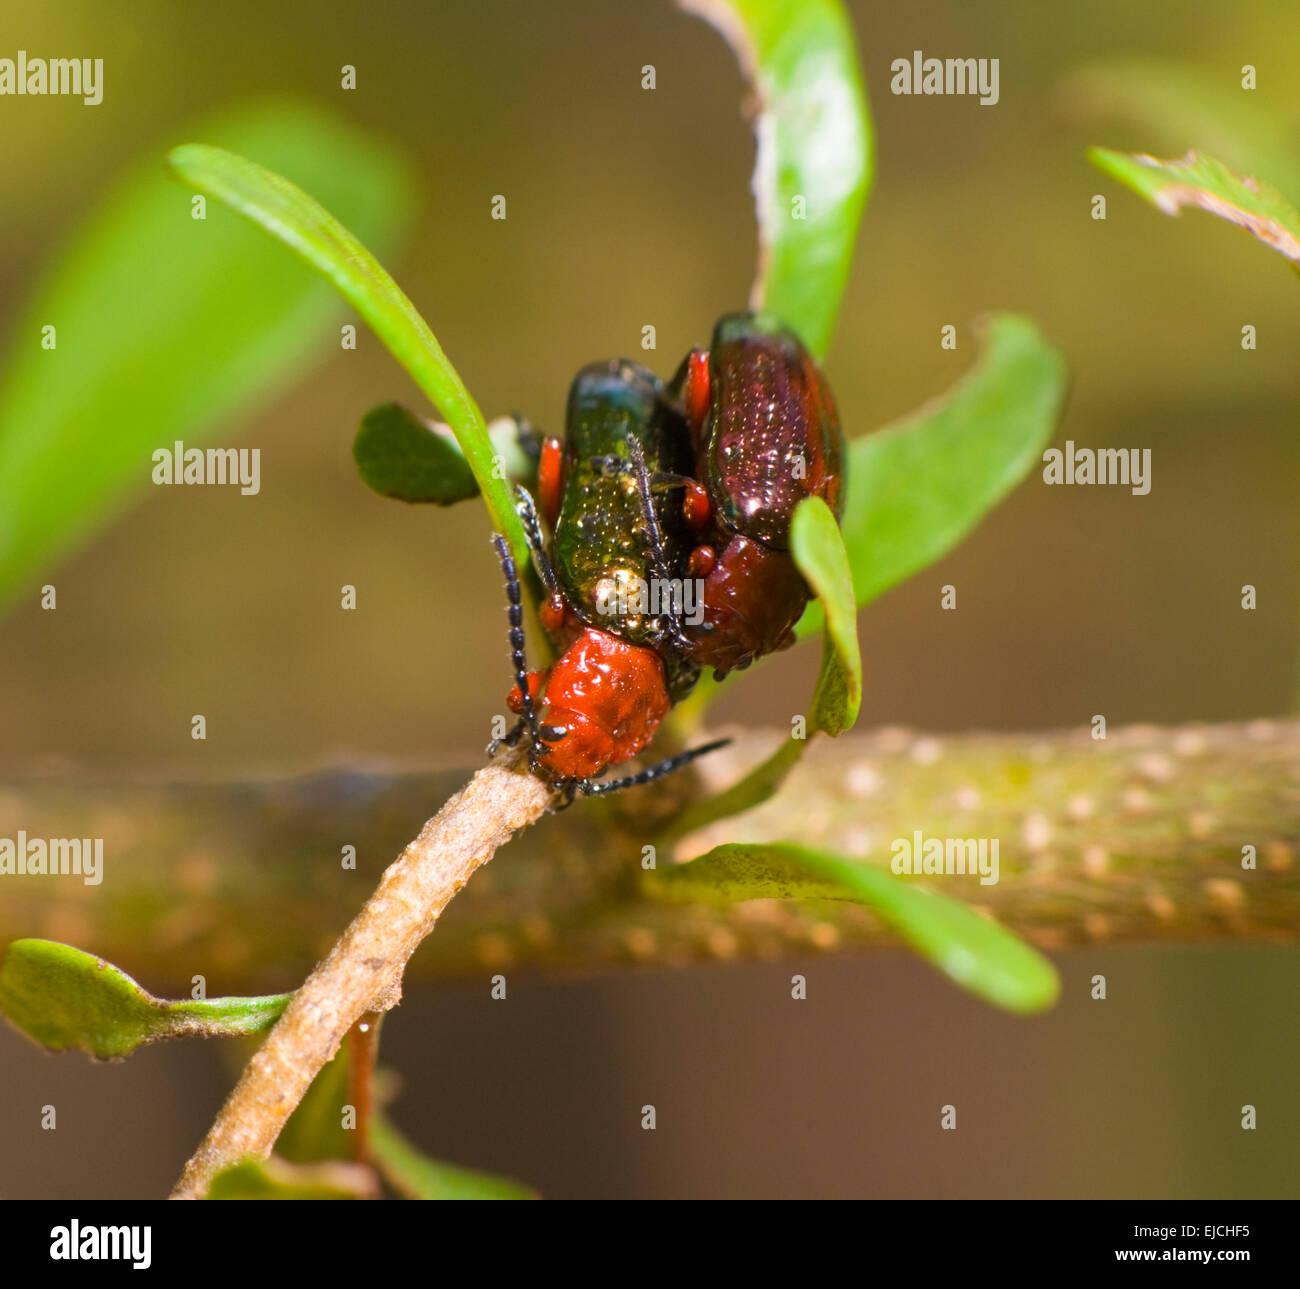 Australian Beetles Stock Photos Amp Australian Beetles Stock